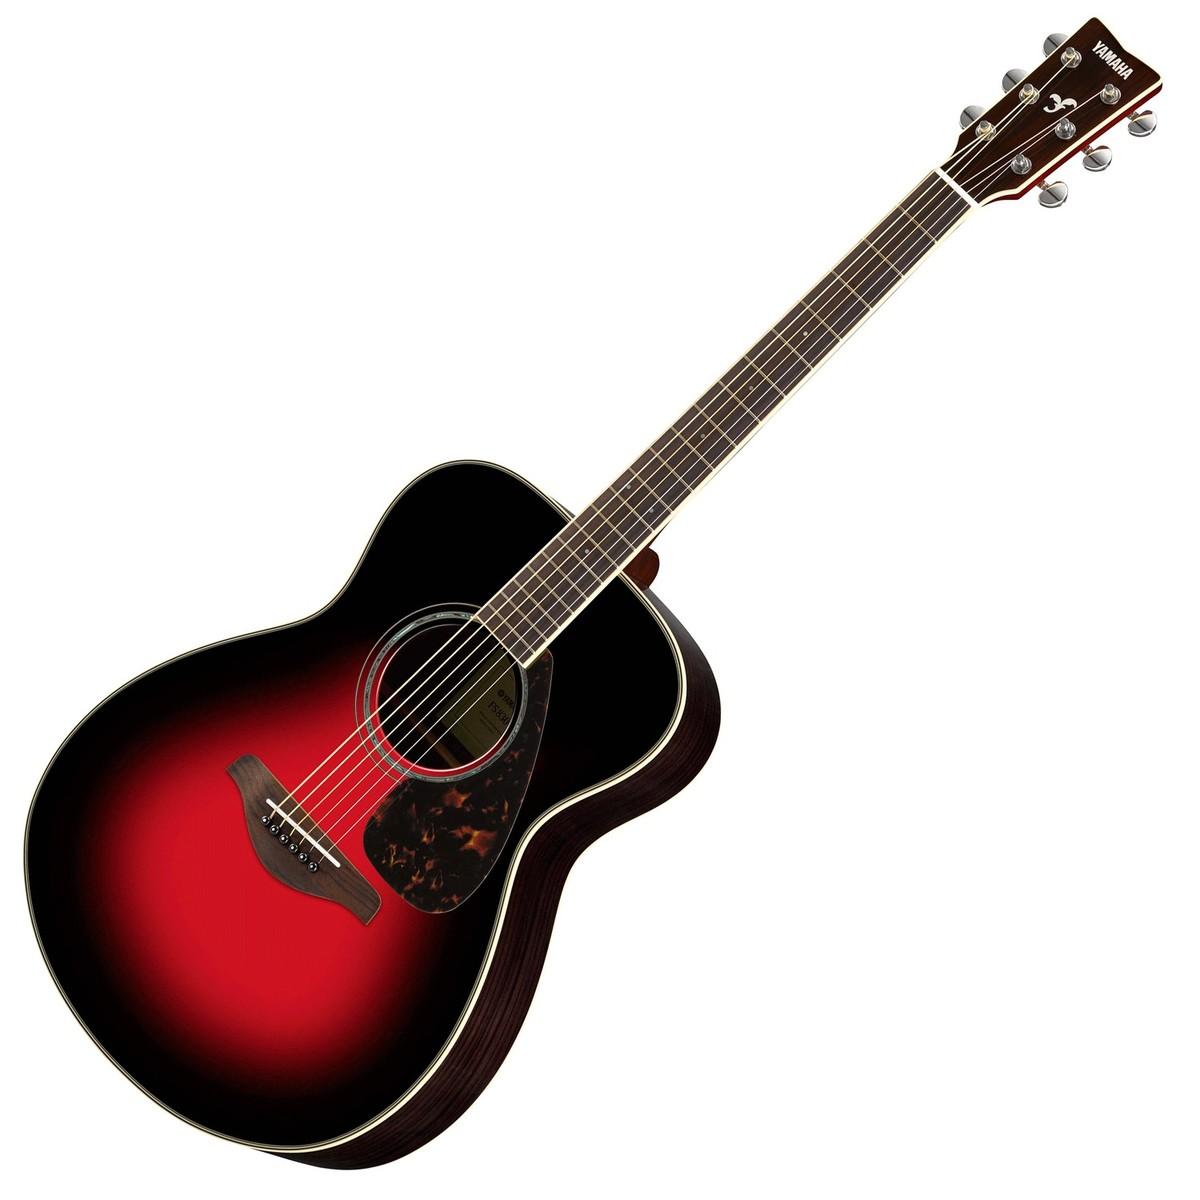 Yamaha fs830 acoustic guitar dusk sun red at for Acoustic yamaha guitar